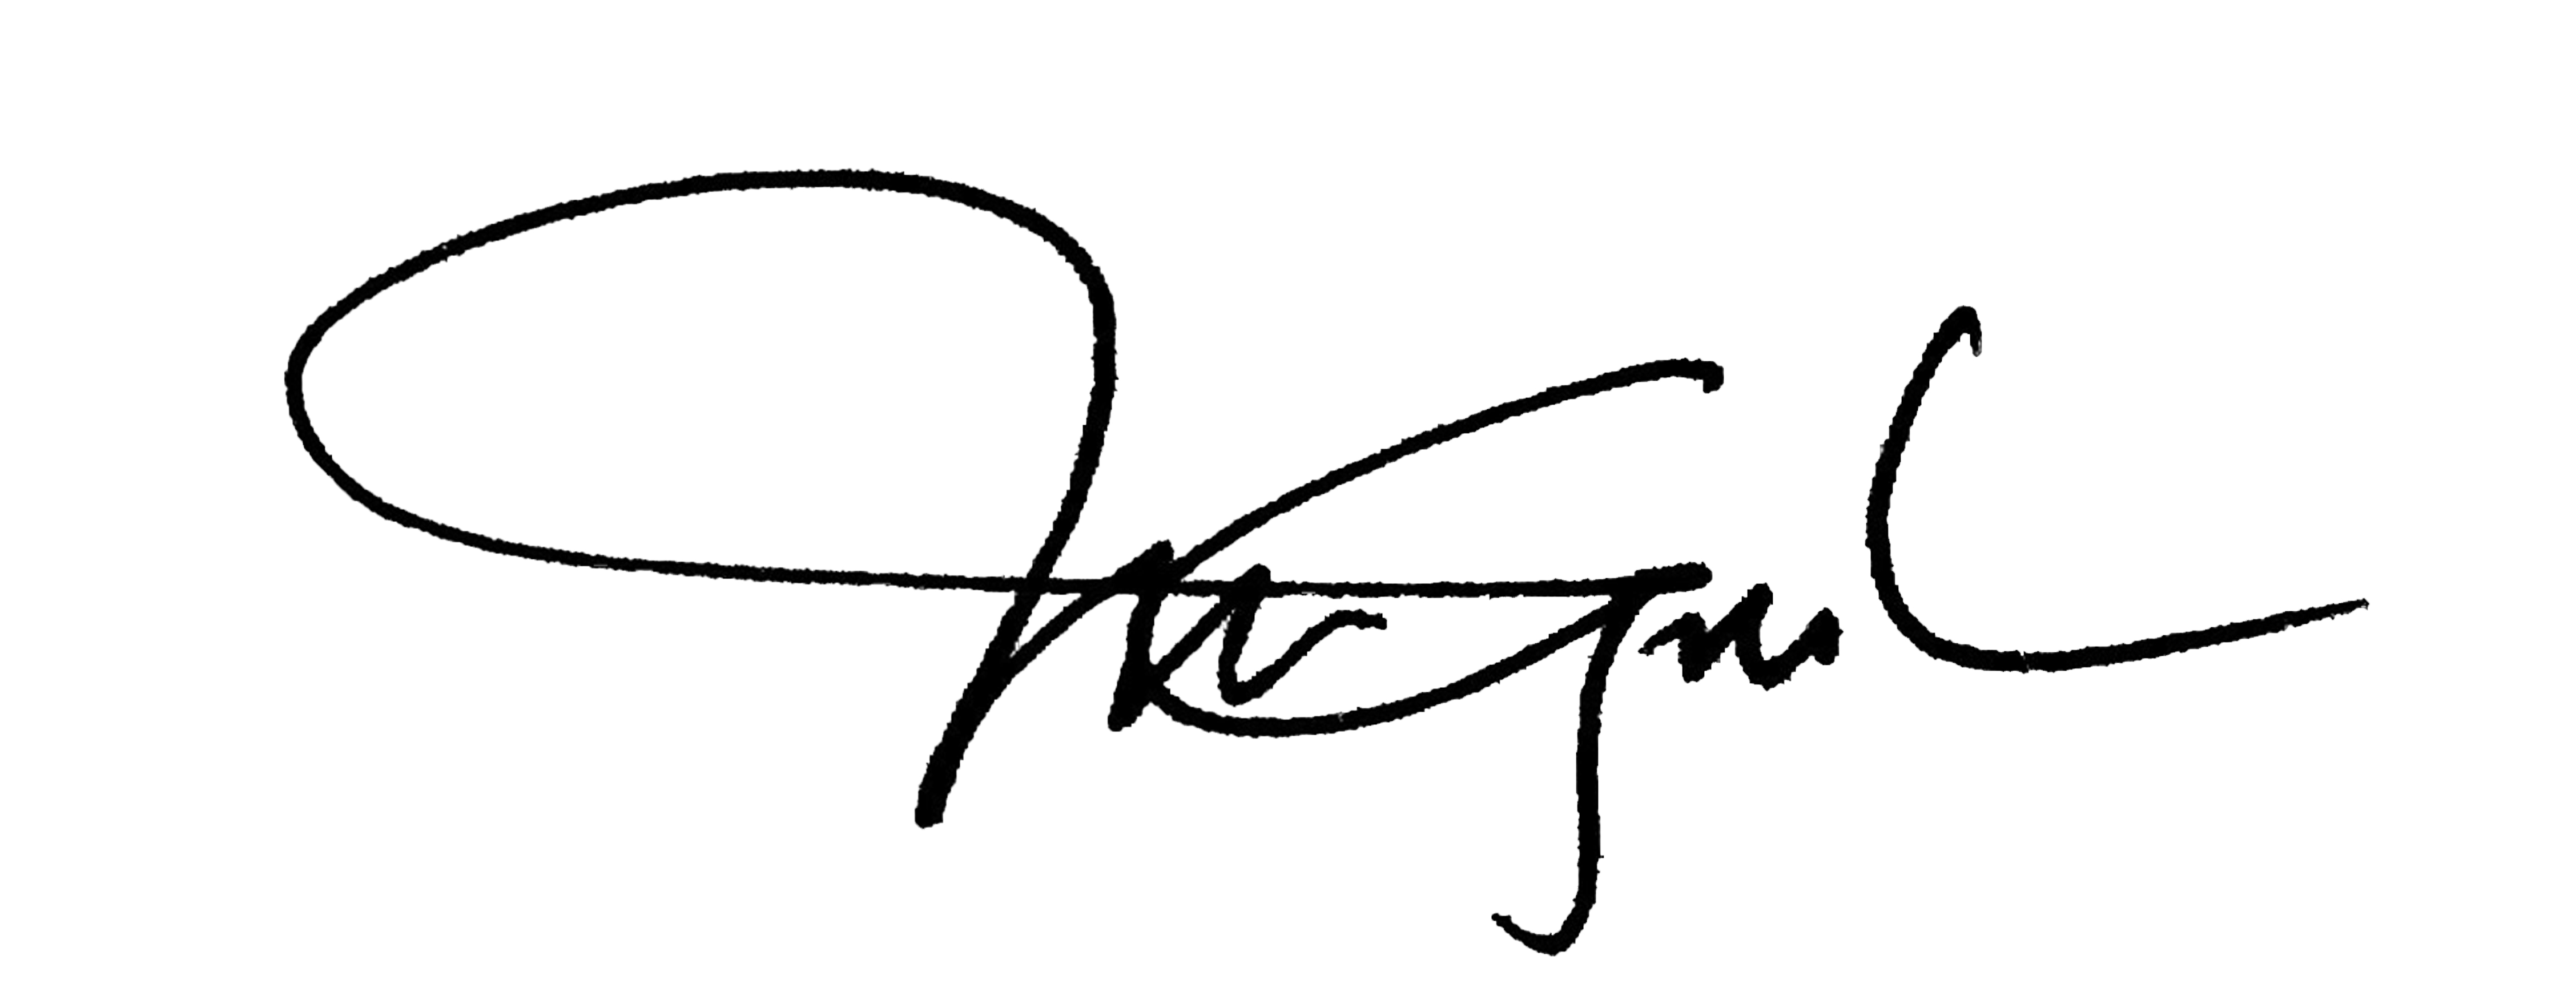 Angela Merici Gabriel's Signature